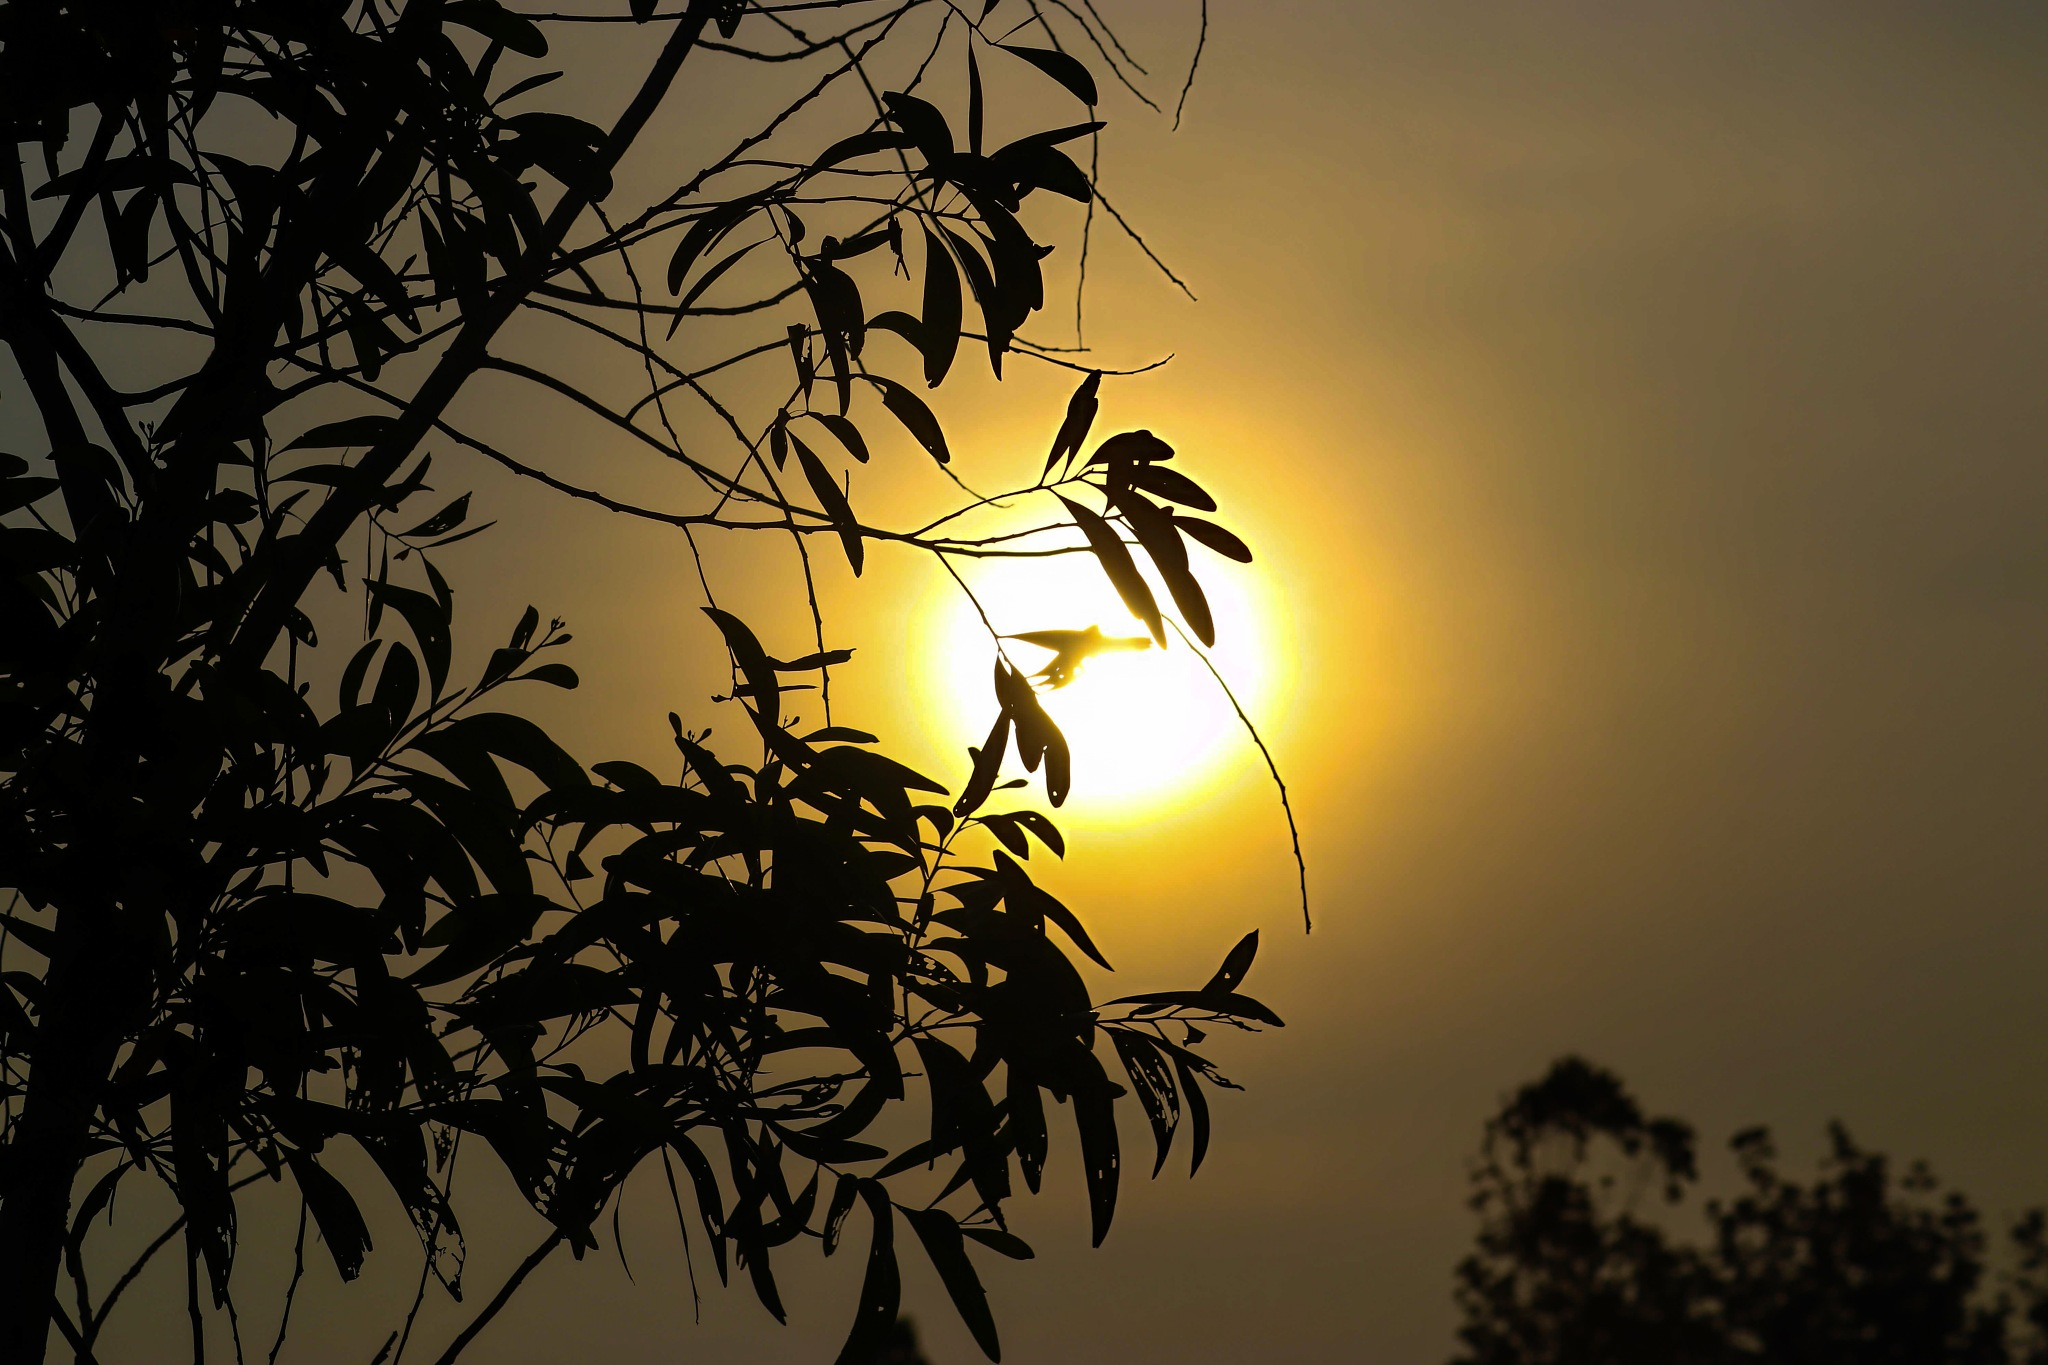 Sunset by Adarsh Prasad